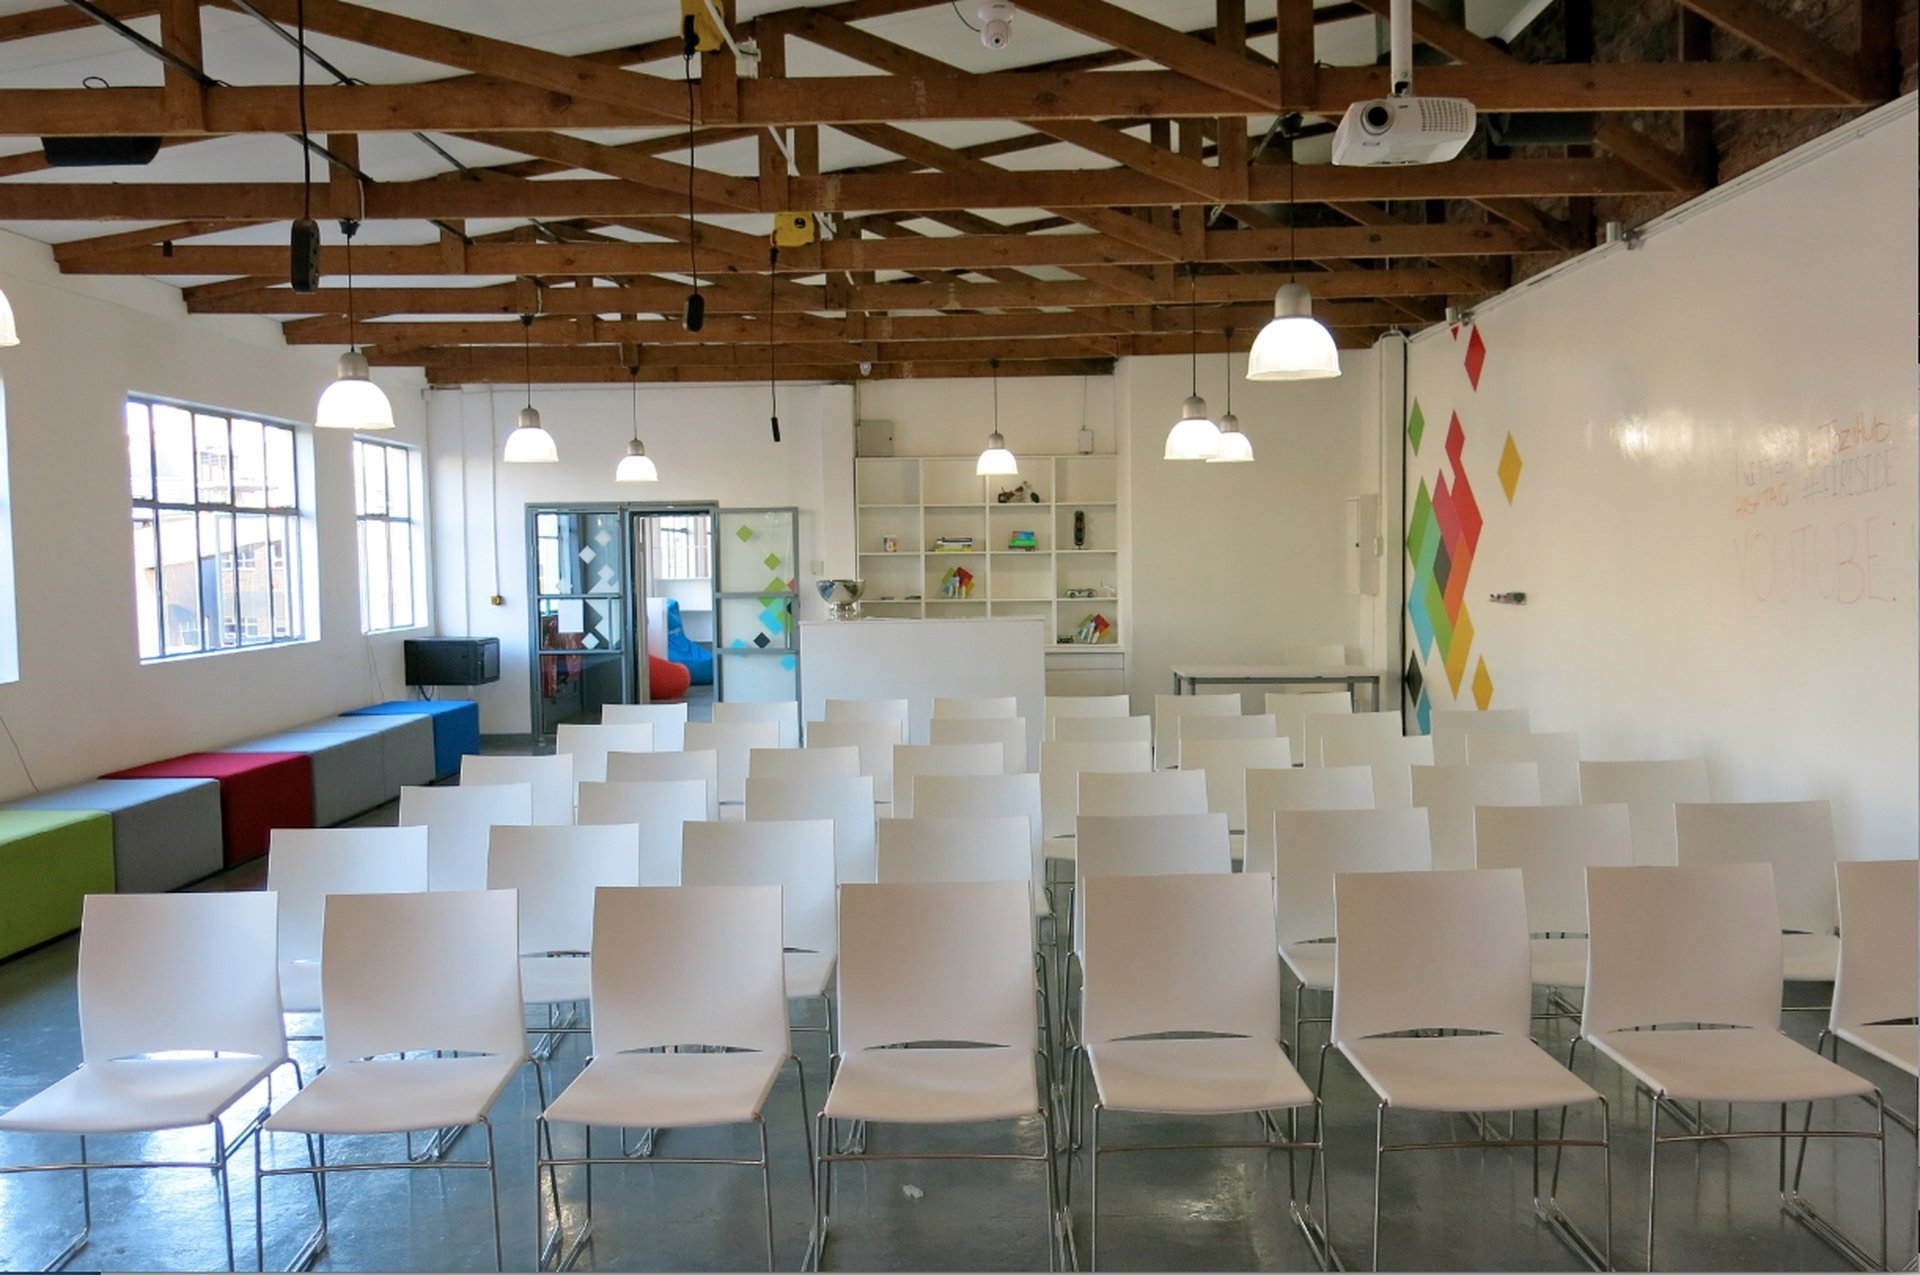 Johannesburg training rooms Salle de réunion Jozi Hub - Seminar Room image 0